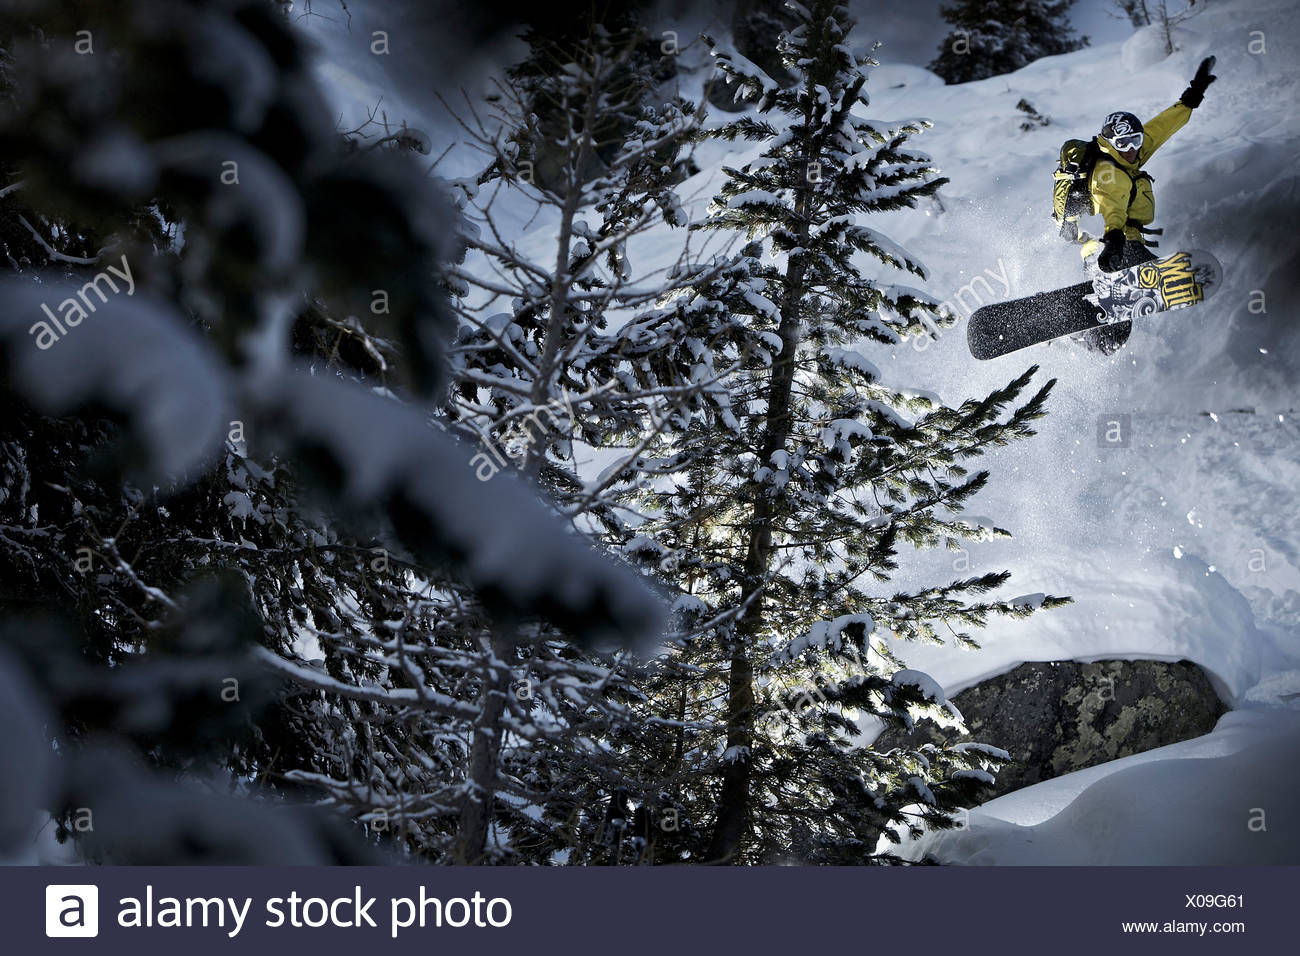 Snowboarder jumping, Chandolin, Anniviers, Valais, Switzerland - Stock Image